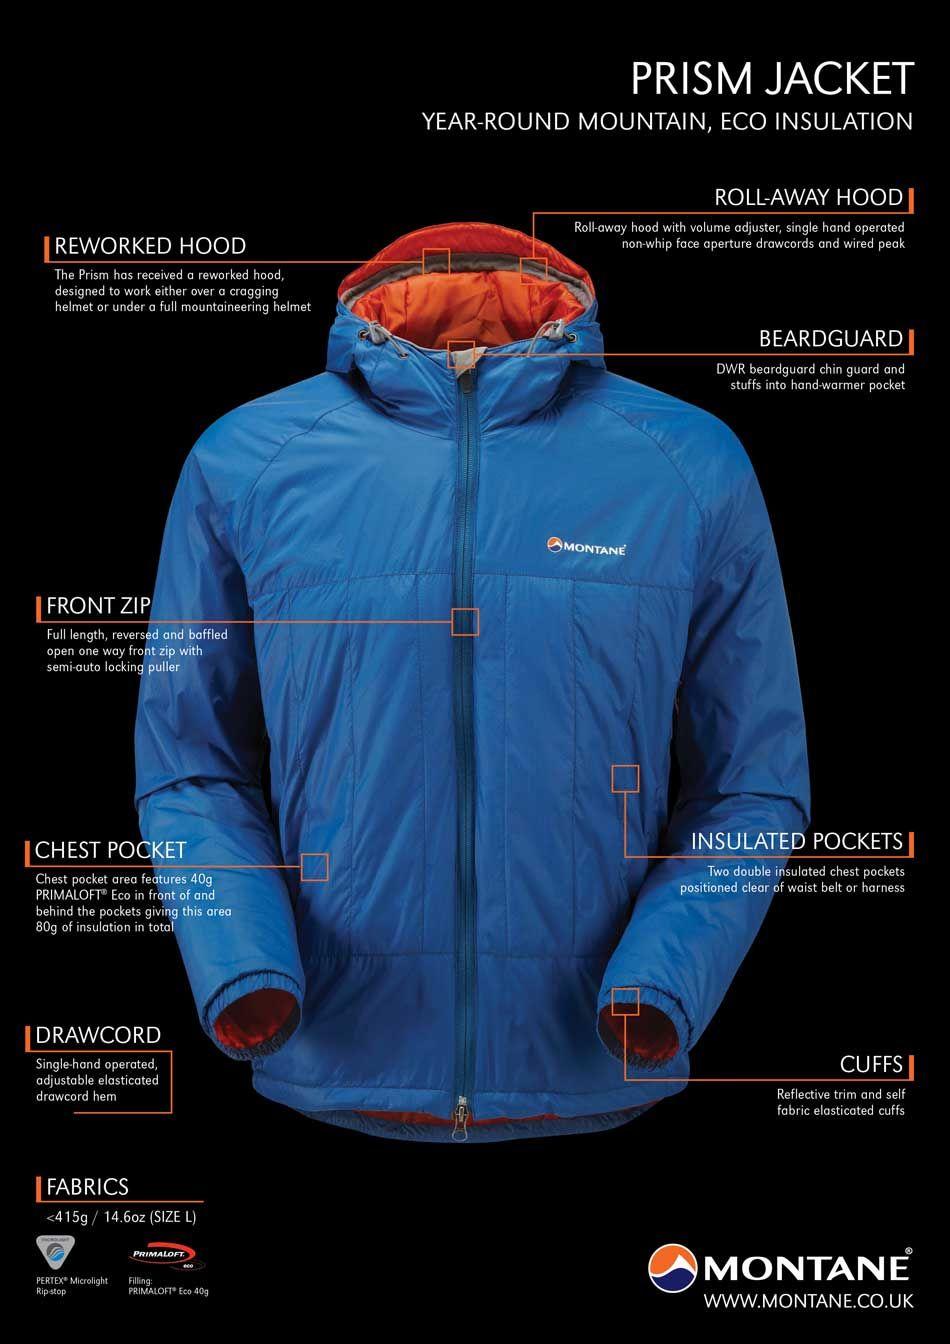 Montane Prism Jacket The most versatile piece of